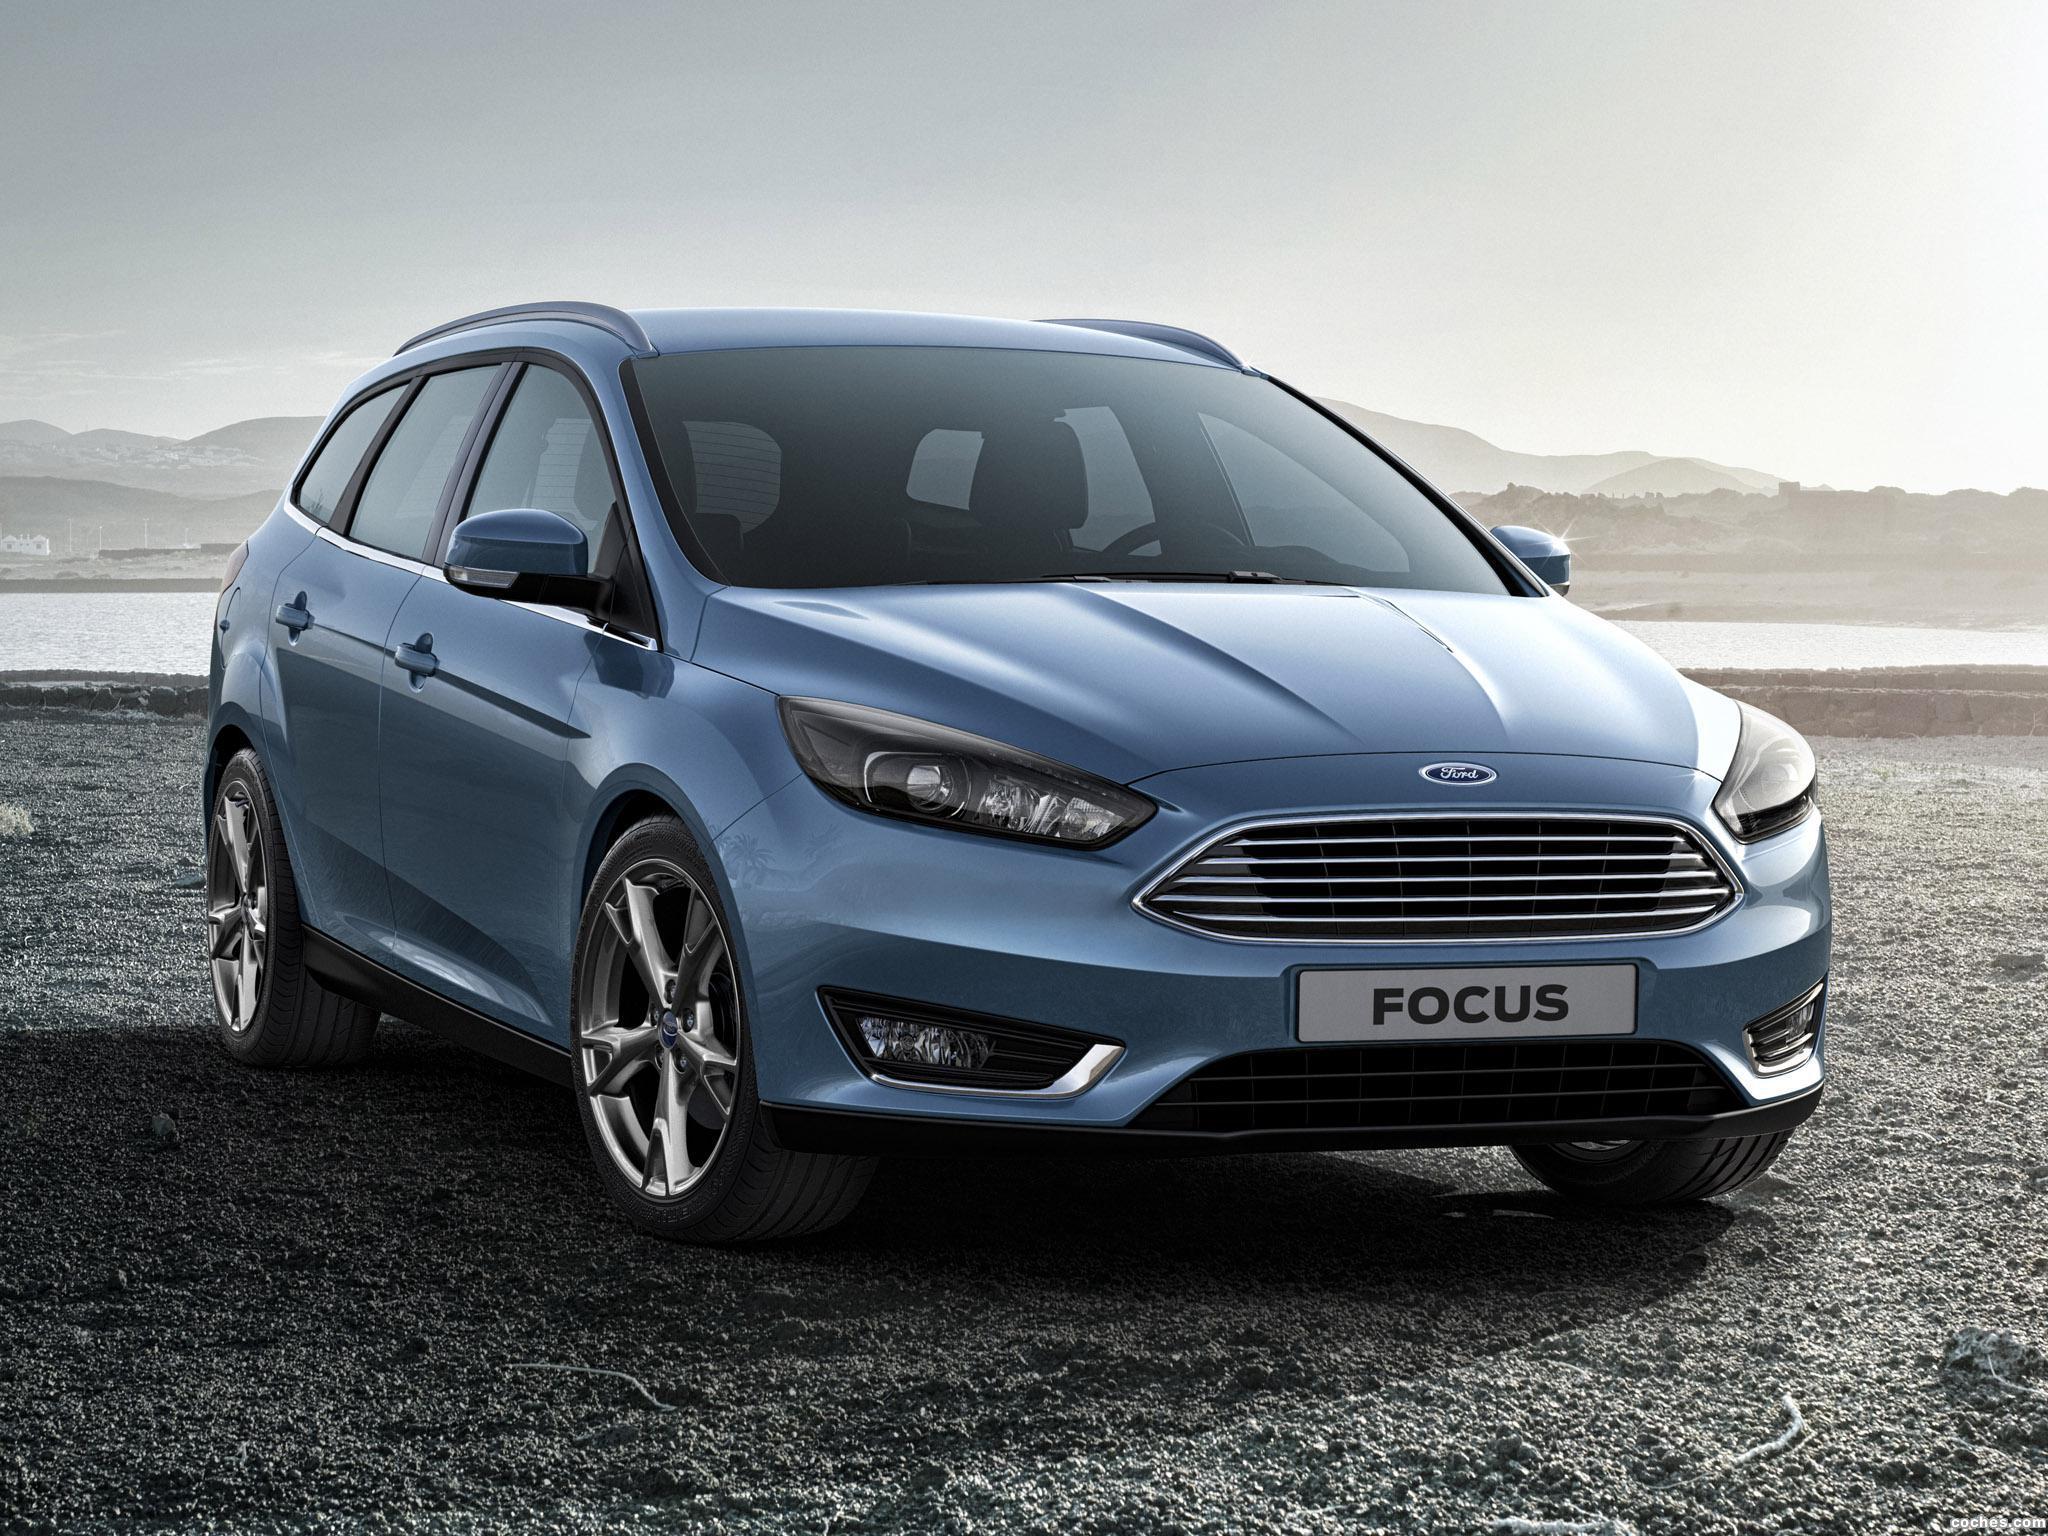 Foto 3 de Ford Focus Turnier 2014